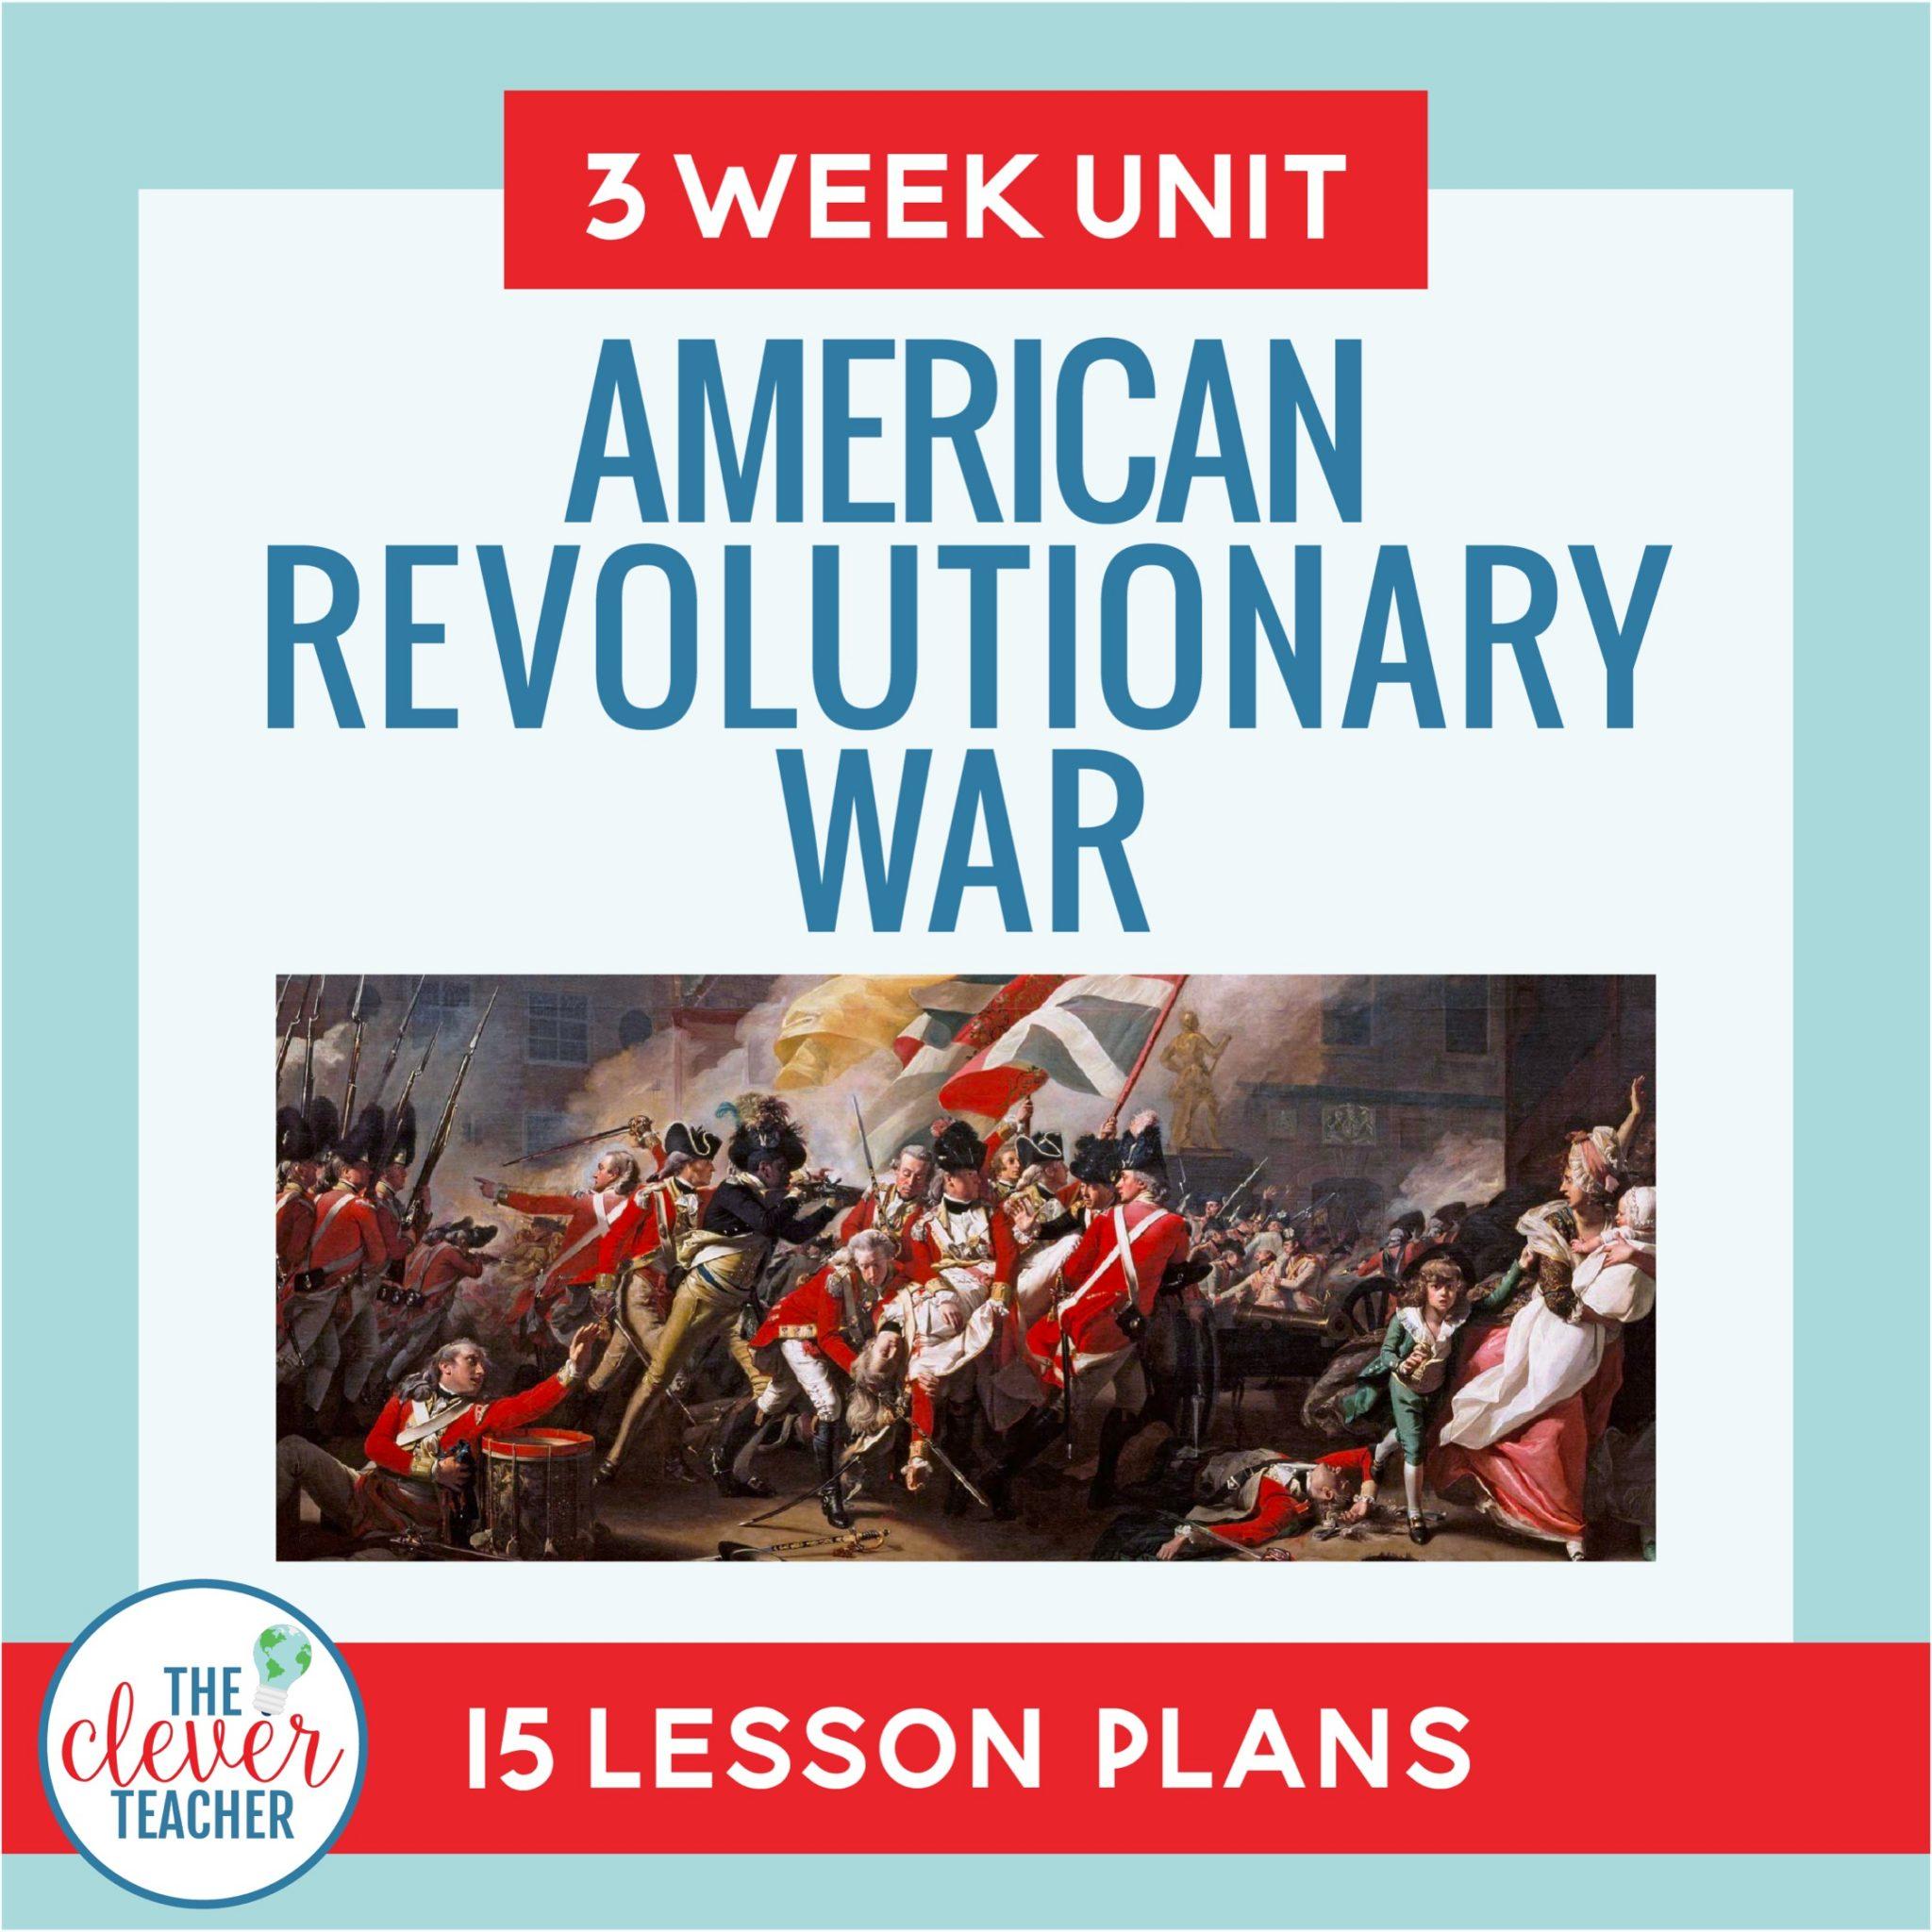 medium resolution of Revolutionary War: 3 Week Unit   Distance Learning   for Google Classroom    The Clever Teacher